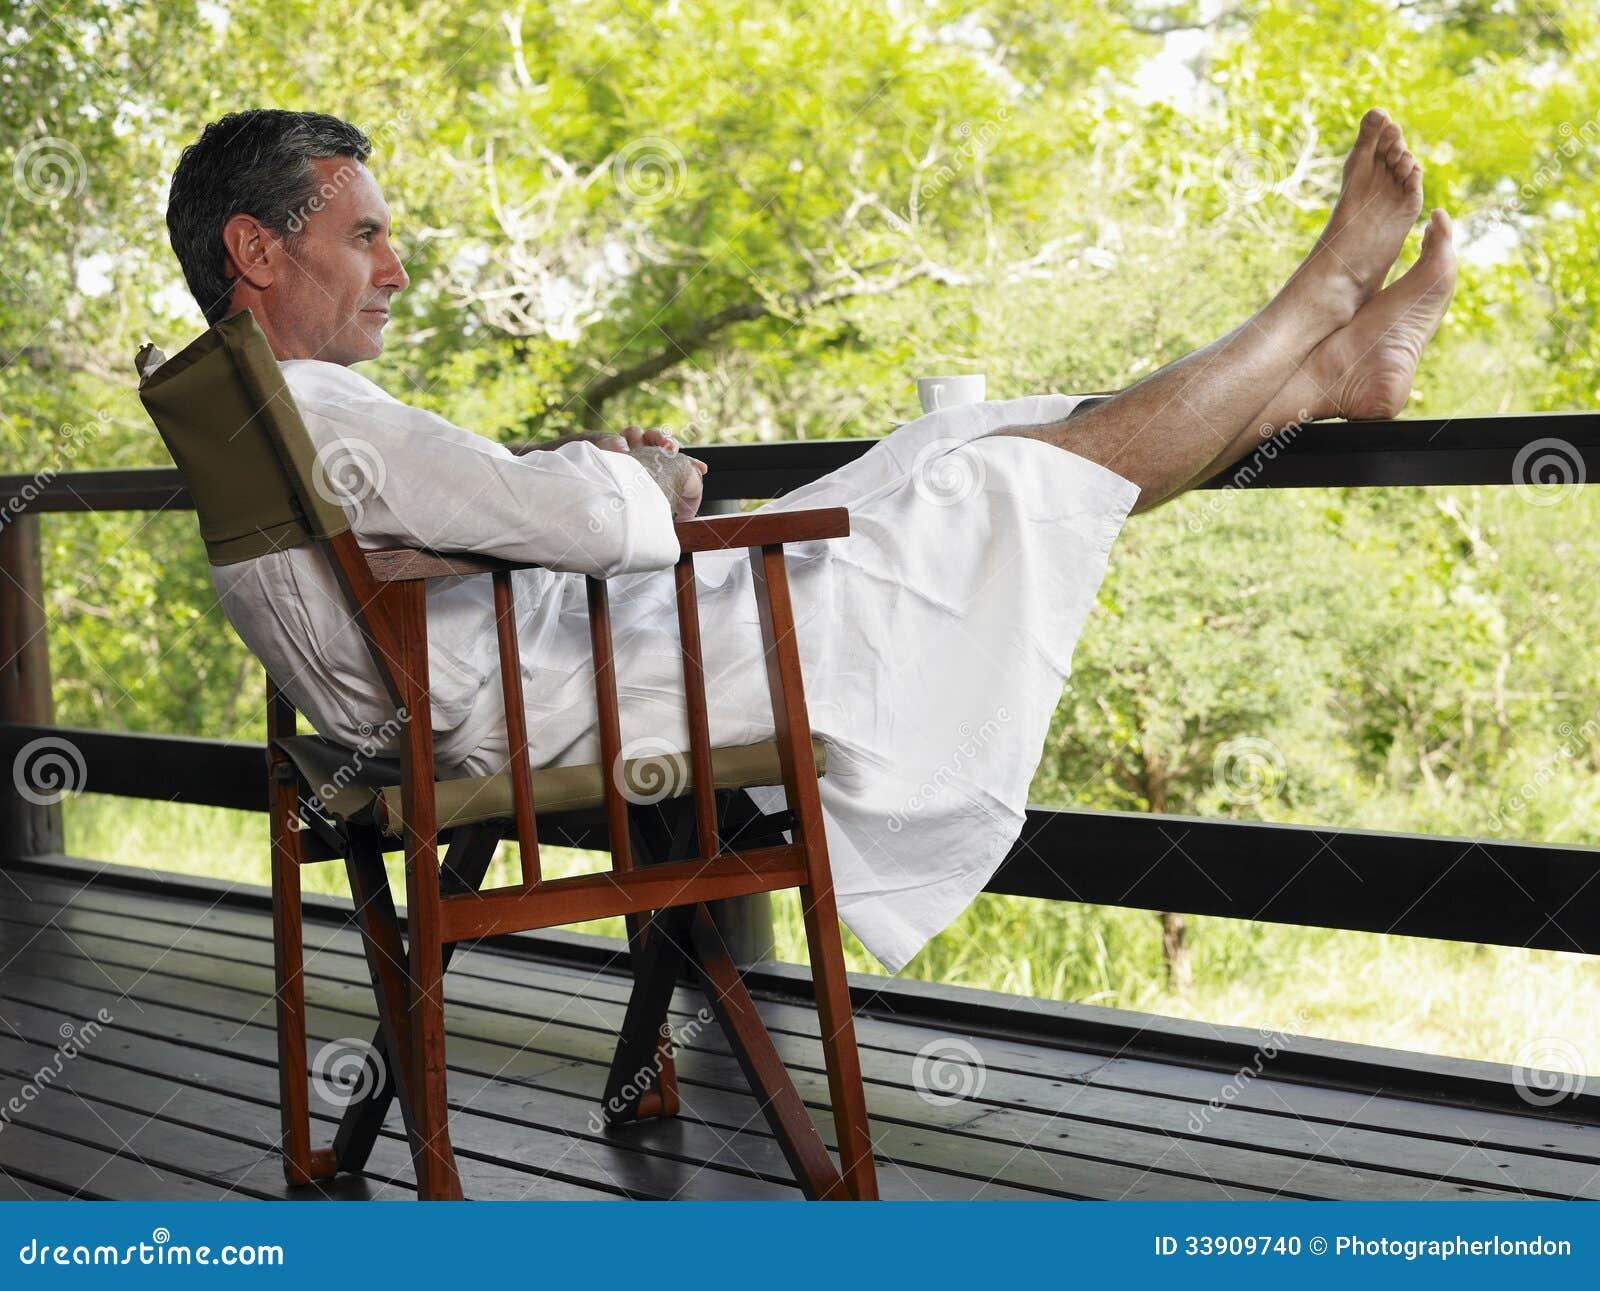 Man In Bathrobe Sitting Terrace With Feet Up Stock